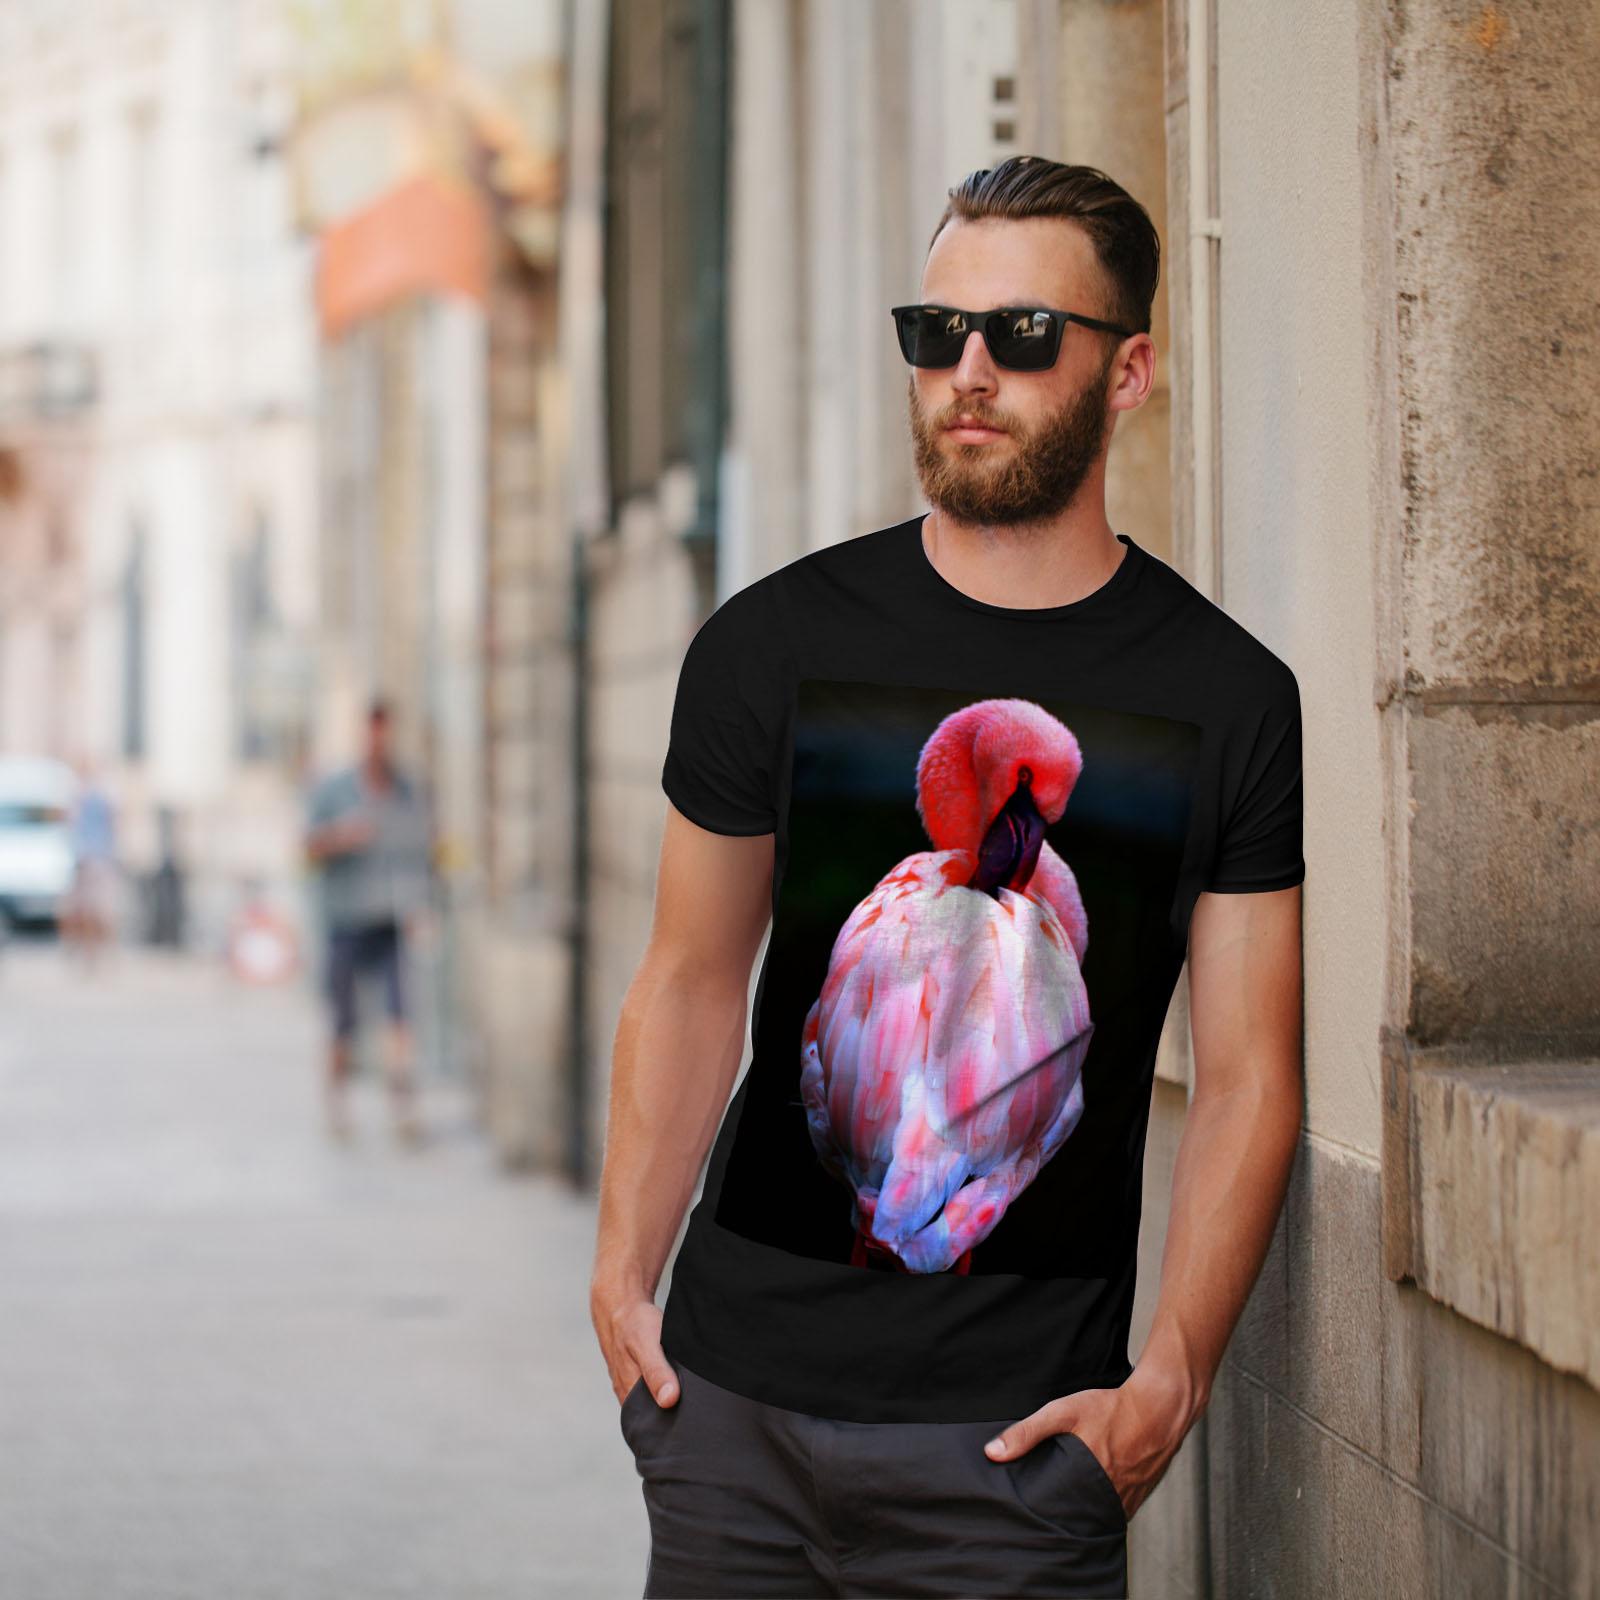 Tropical Graphic Design Printed Tee Wellcoda Pink Flamingo Island Mens T-shirt